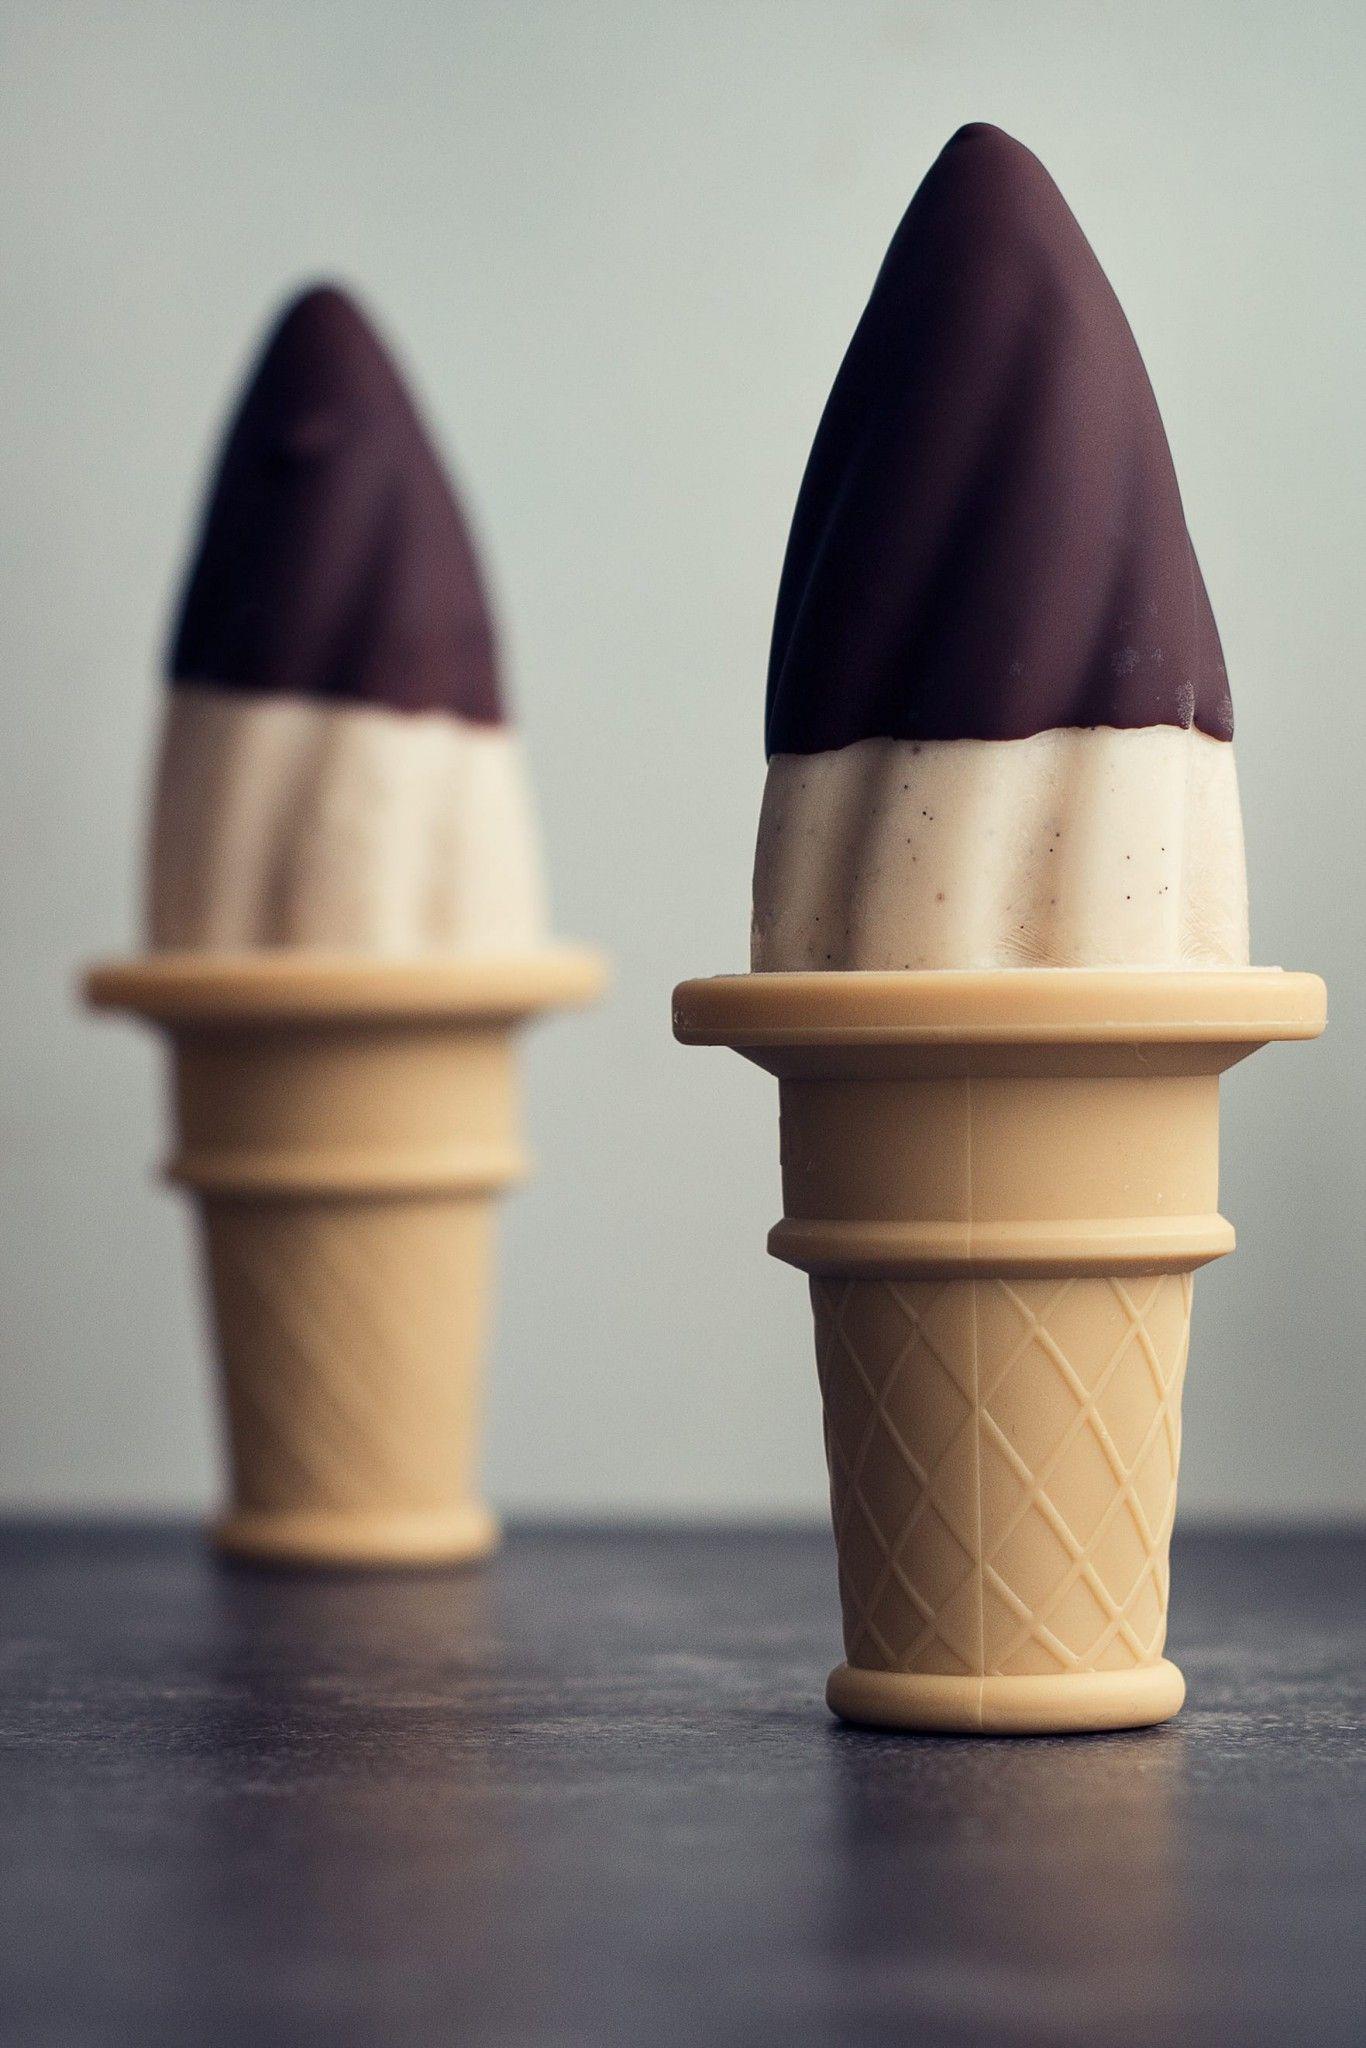 Low Calorie Chocolate Dipped Banana Ice Cream Pops Recipe - 86 Calories